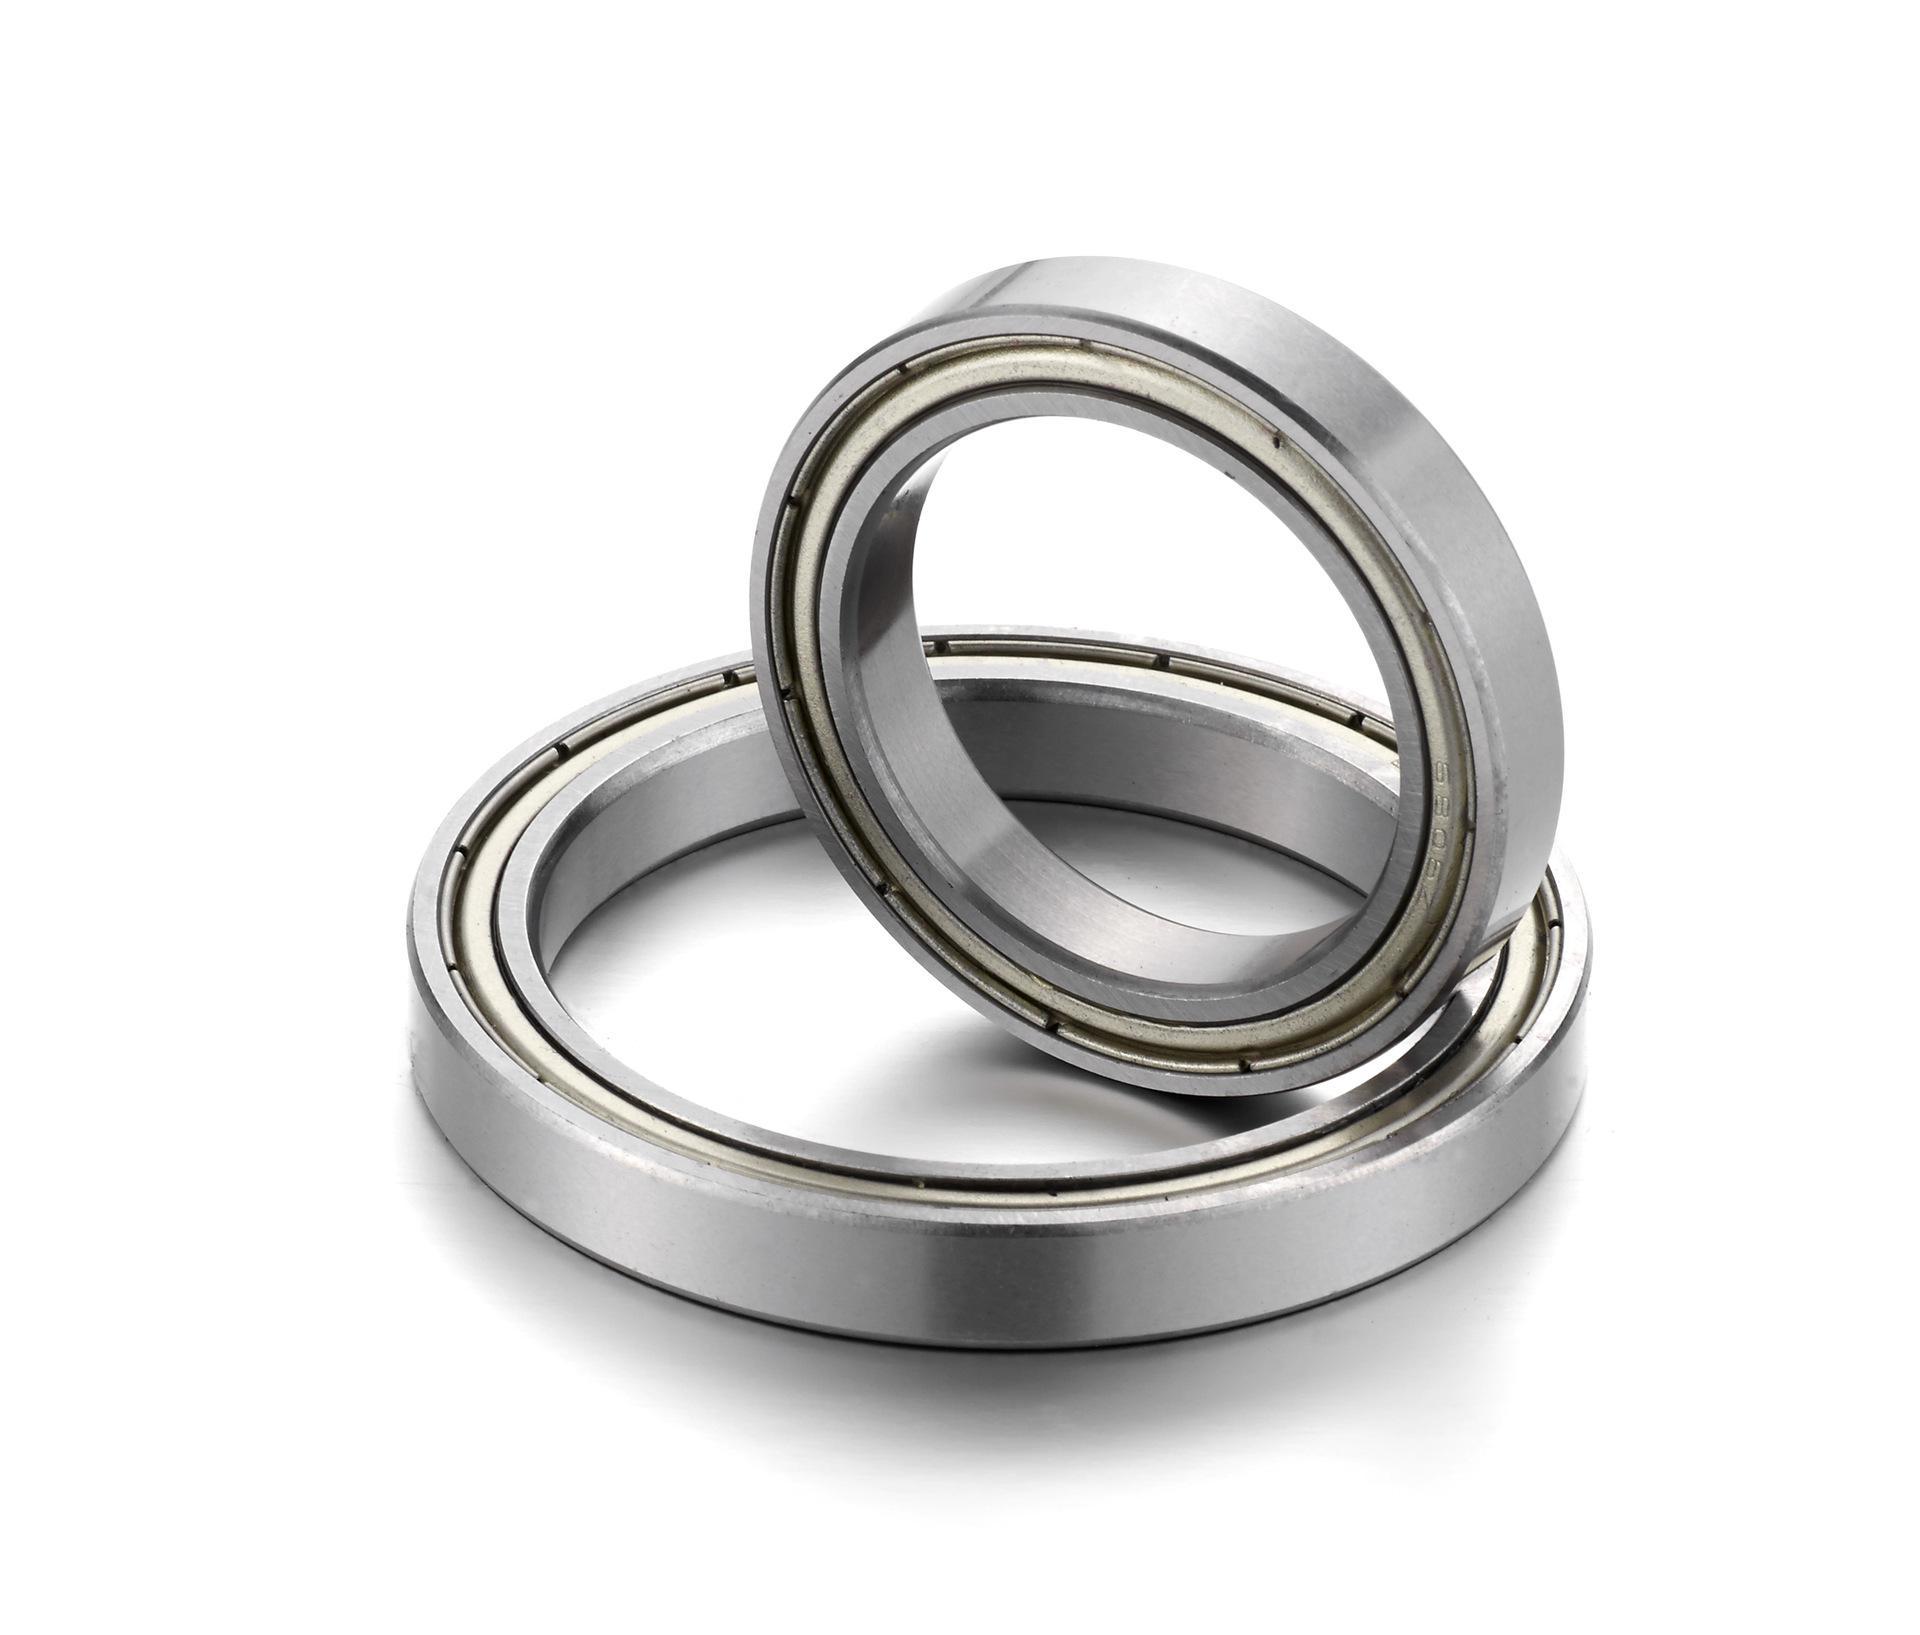 6930M  ABEC-1 150x210x28MM  Metric Thin Section Bearings 61930M Brass cage 1pcs 71822 71822cd p4 7822 110x140x16 mochu thin walled miniature angular contact bearings speed spindle bearings cnc abec 7